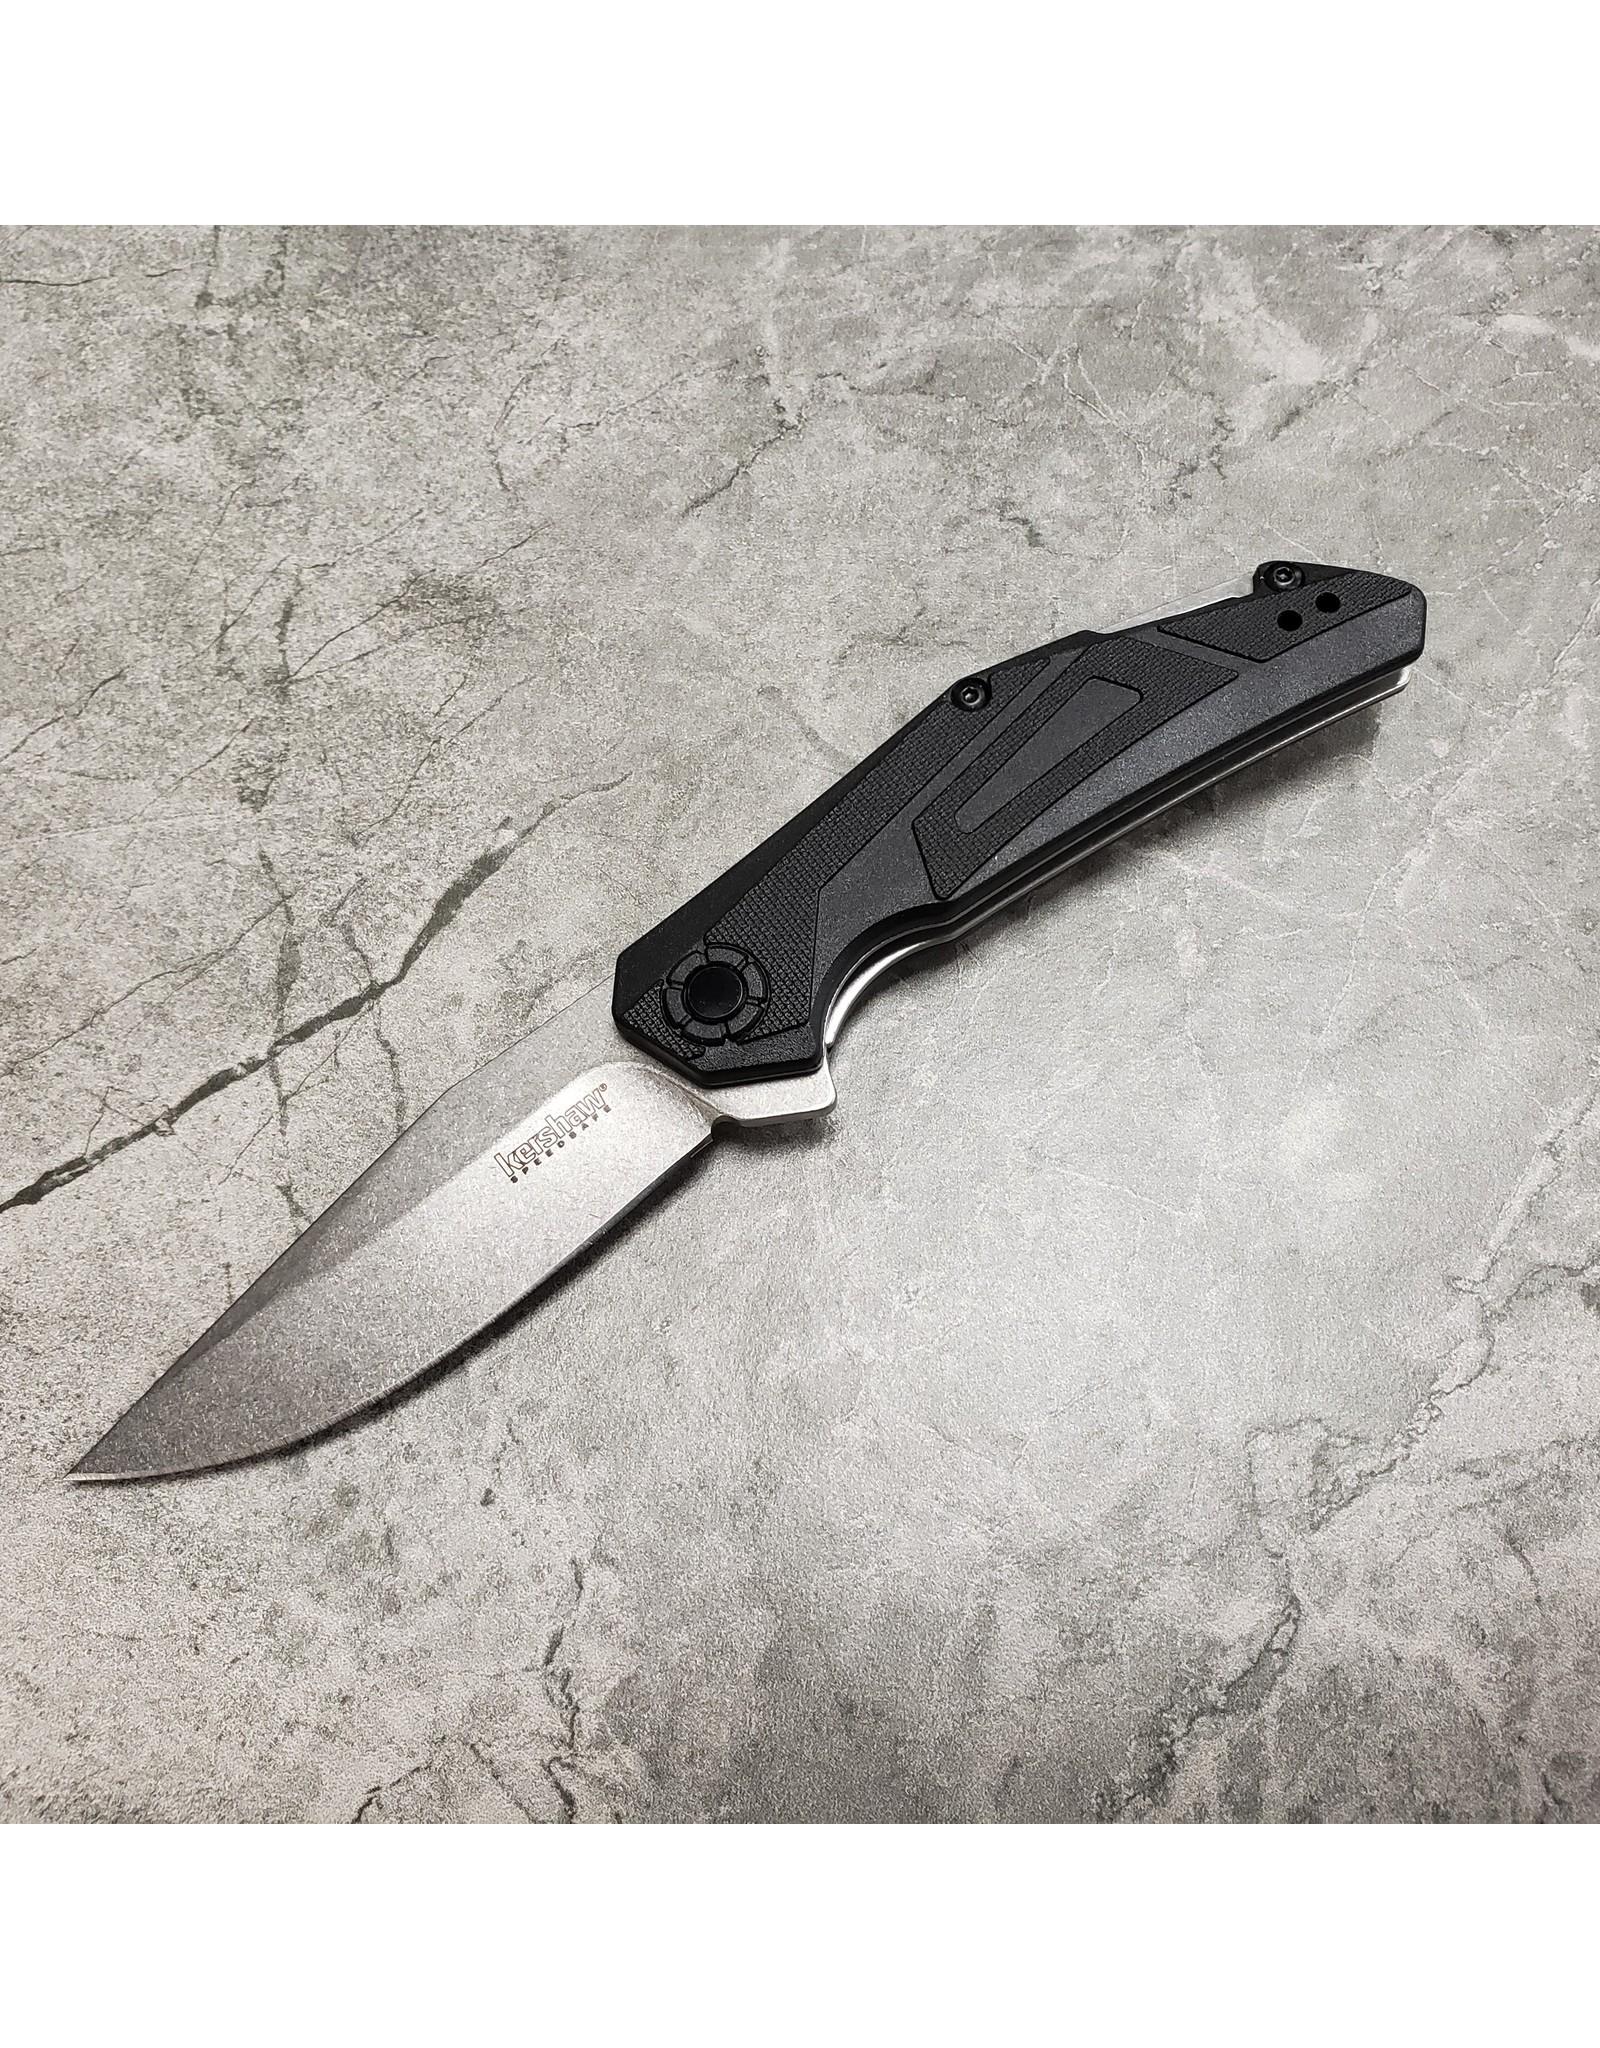 KERSHAW KNIVES CAMSHAFT FOLDING KNIFE